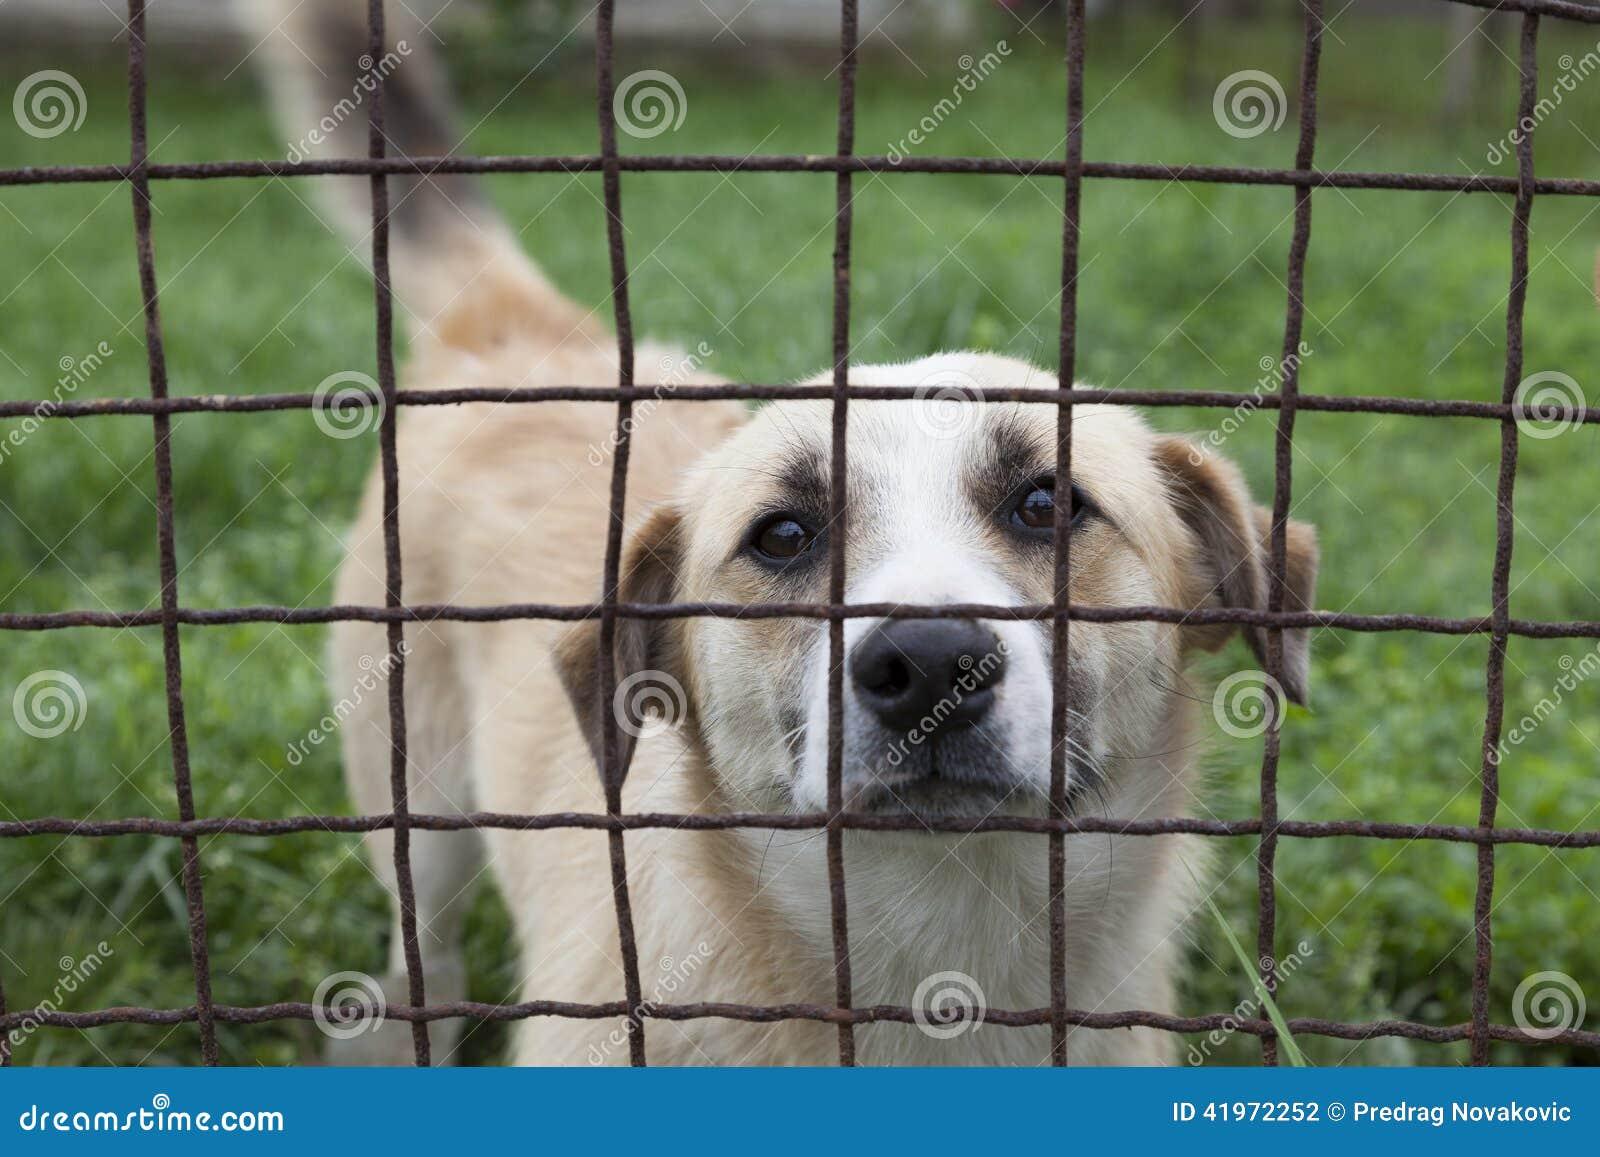 Staket hundstaket : Hundstaket foton - Registrera dig gratis